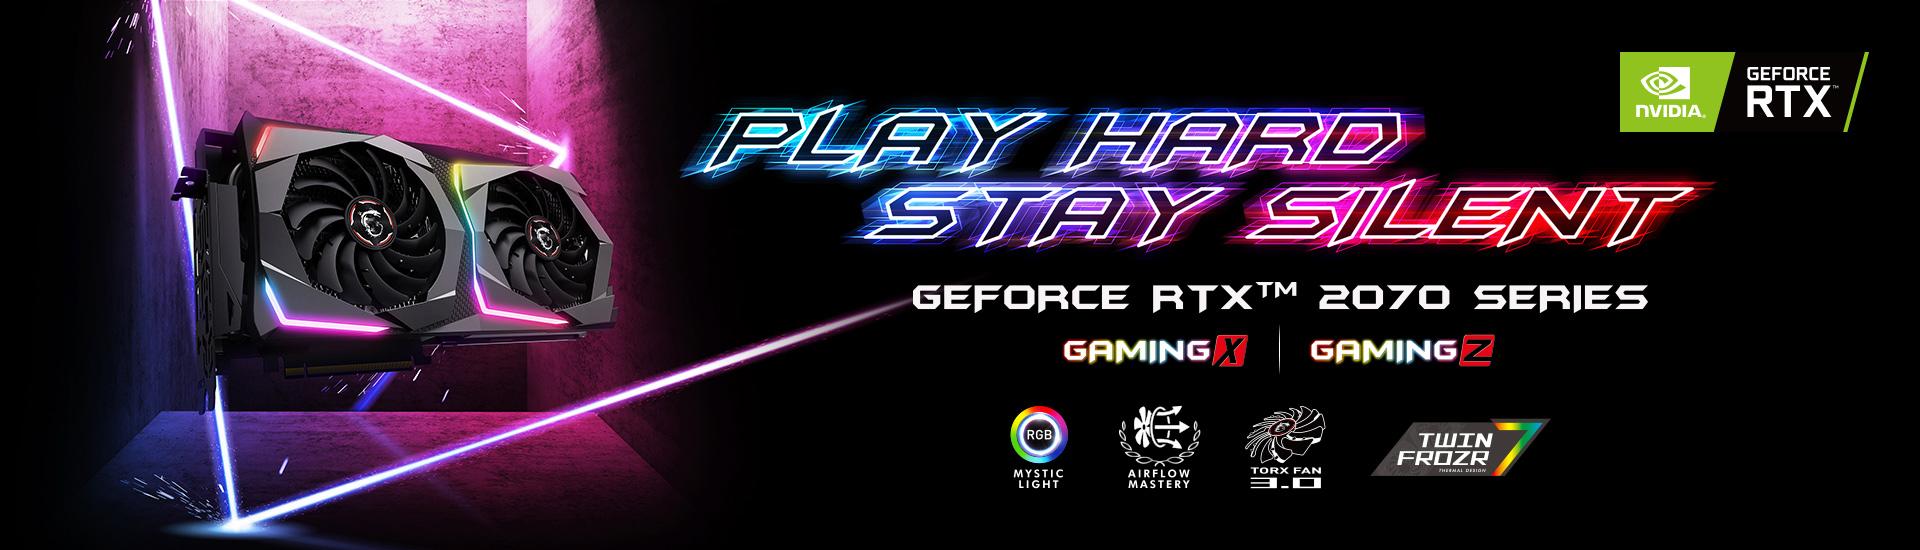 RTX 2070 gaming